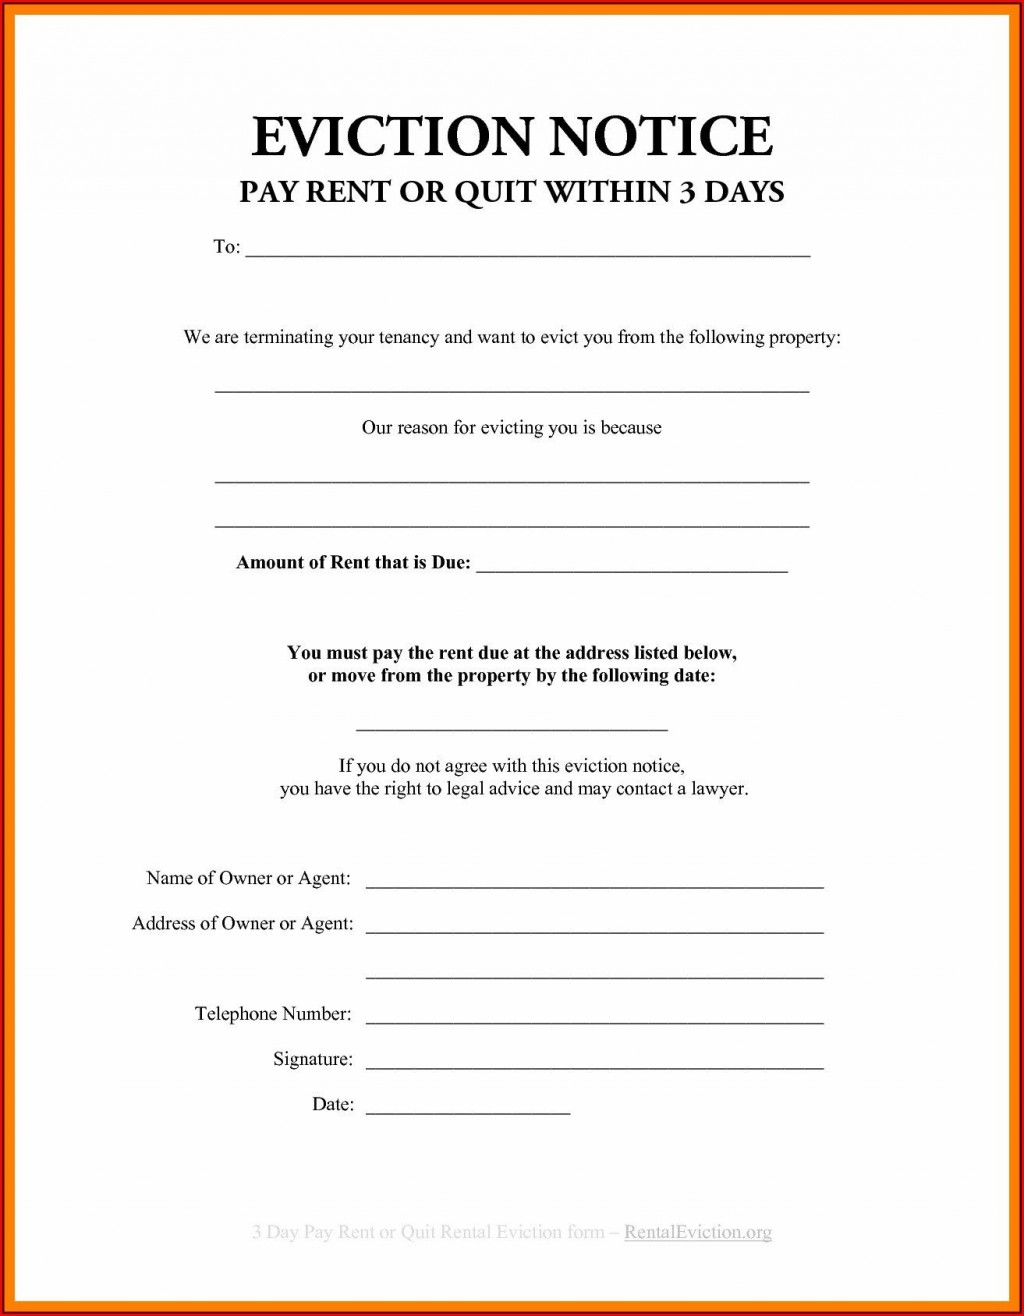 001 Stupendou Eviction Notice Template Free Design  30 Day Uk Word DocumentLarge